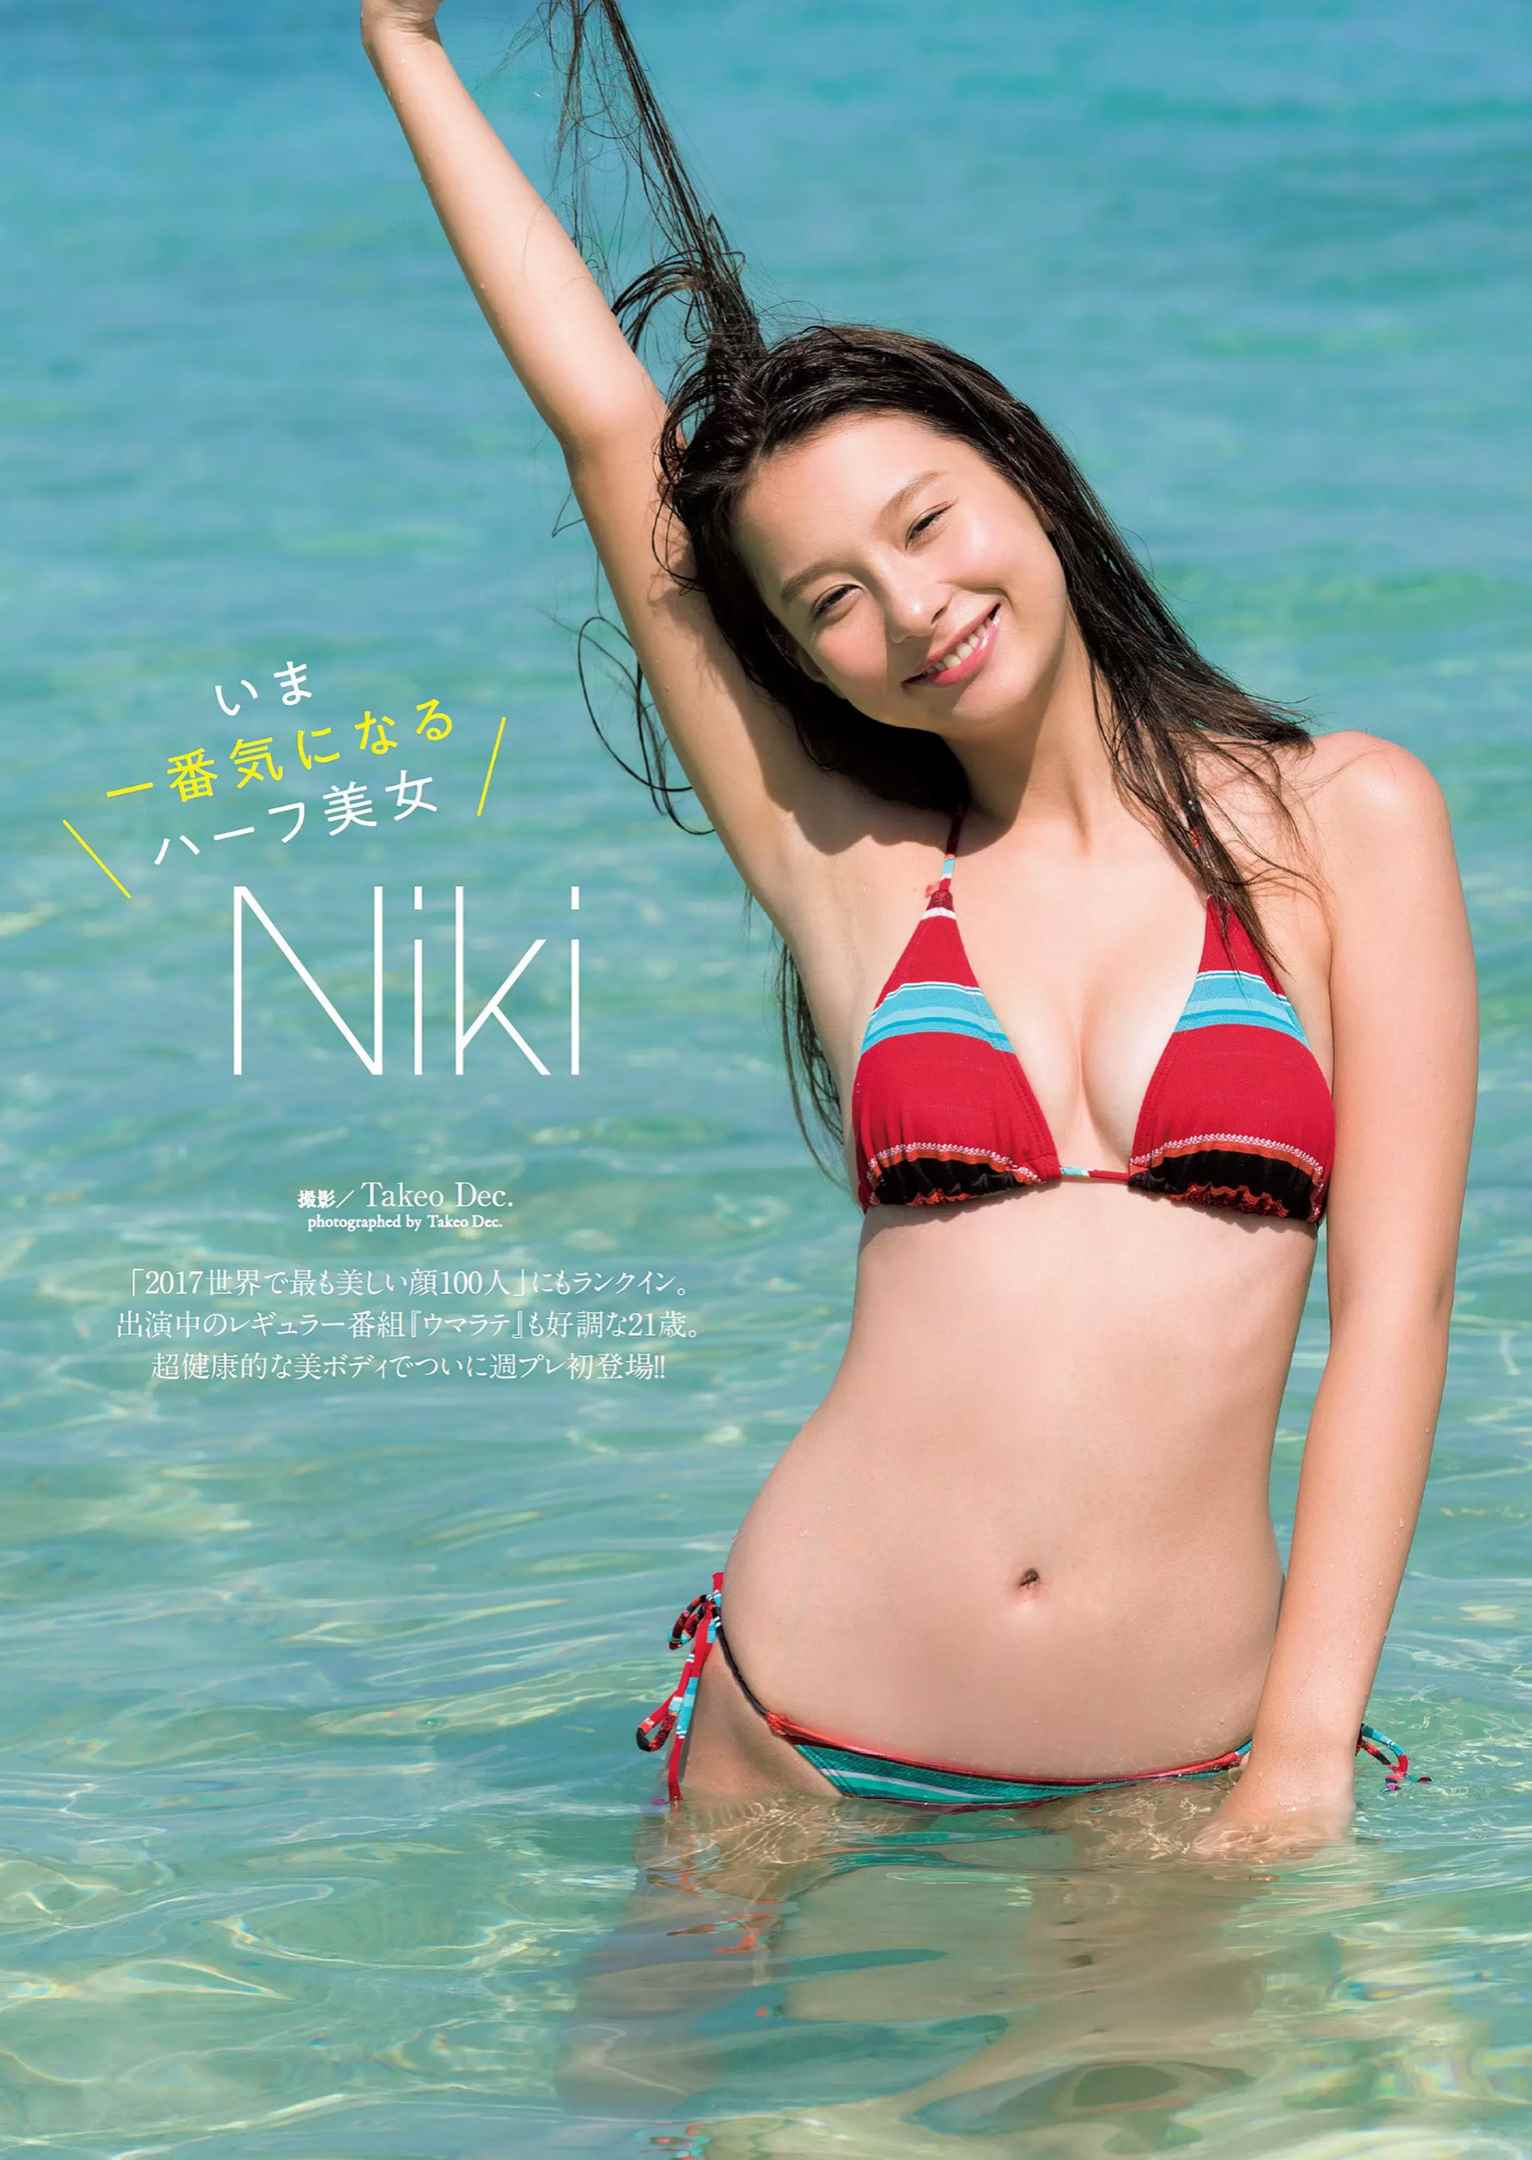 Niki(丹羽仁希)のヌード・水着グラビア等抜けるエロ画像110枚・15枚目の画像